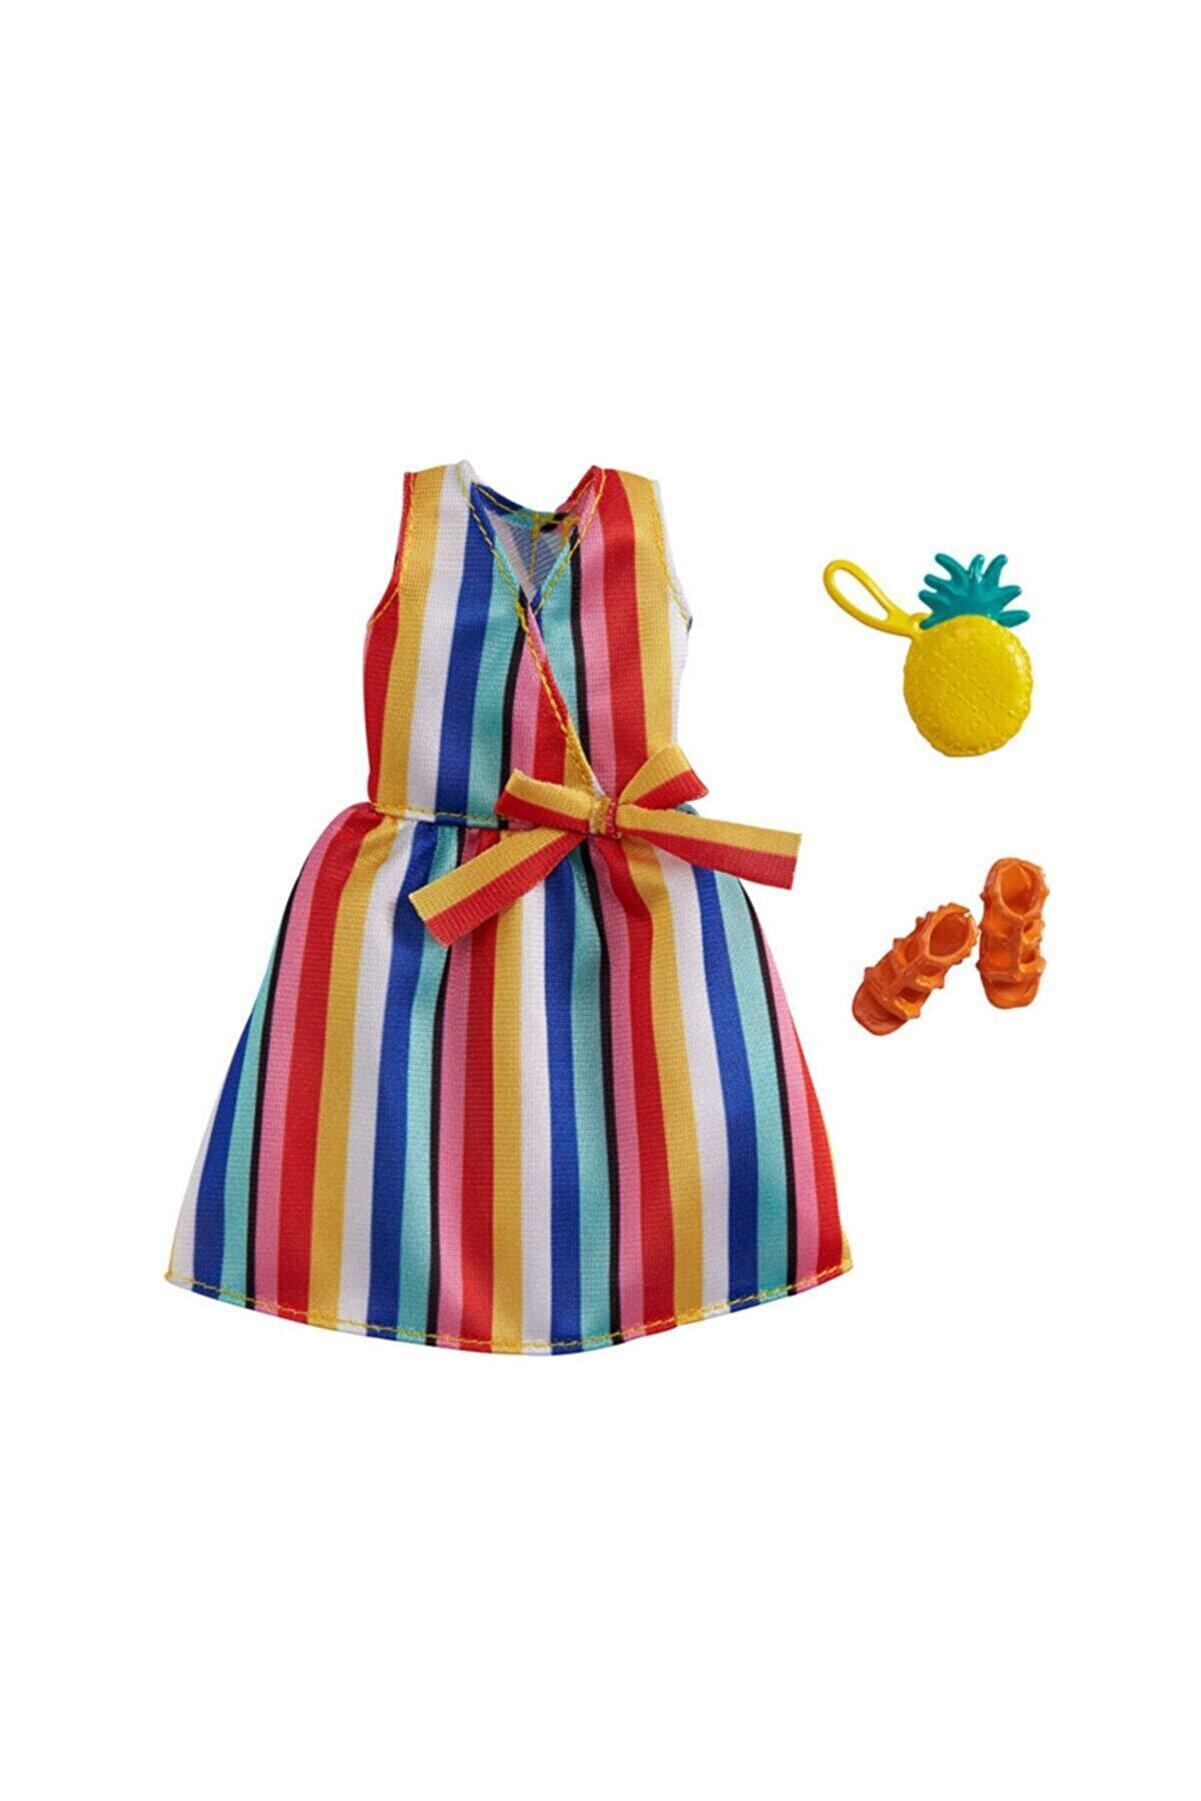 Barbie Nin Kıyafet Koleksiyonu Gwd96-grb98